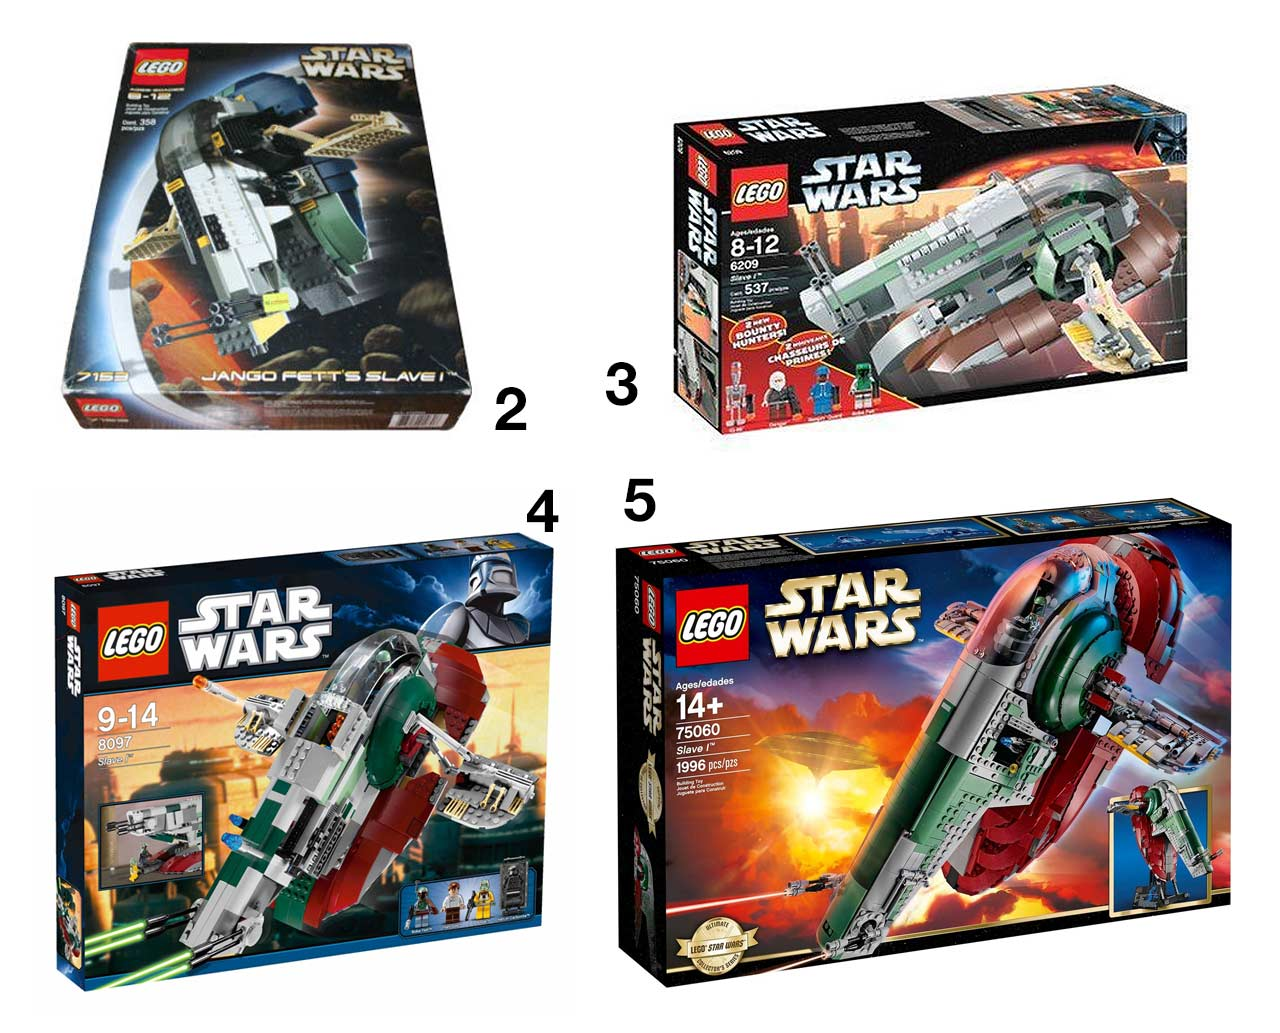 Star Wars Boba Fett's Slave I: 20th Anniversary Edition LEGO